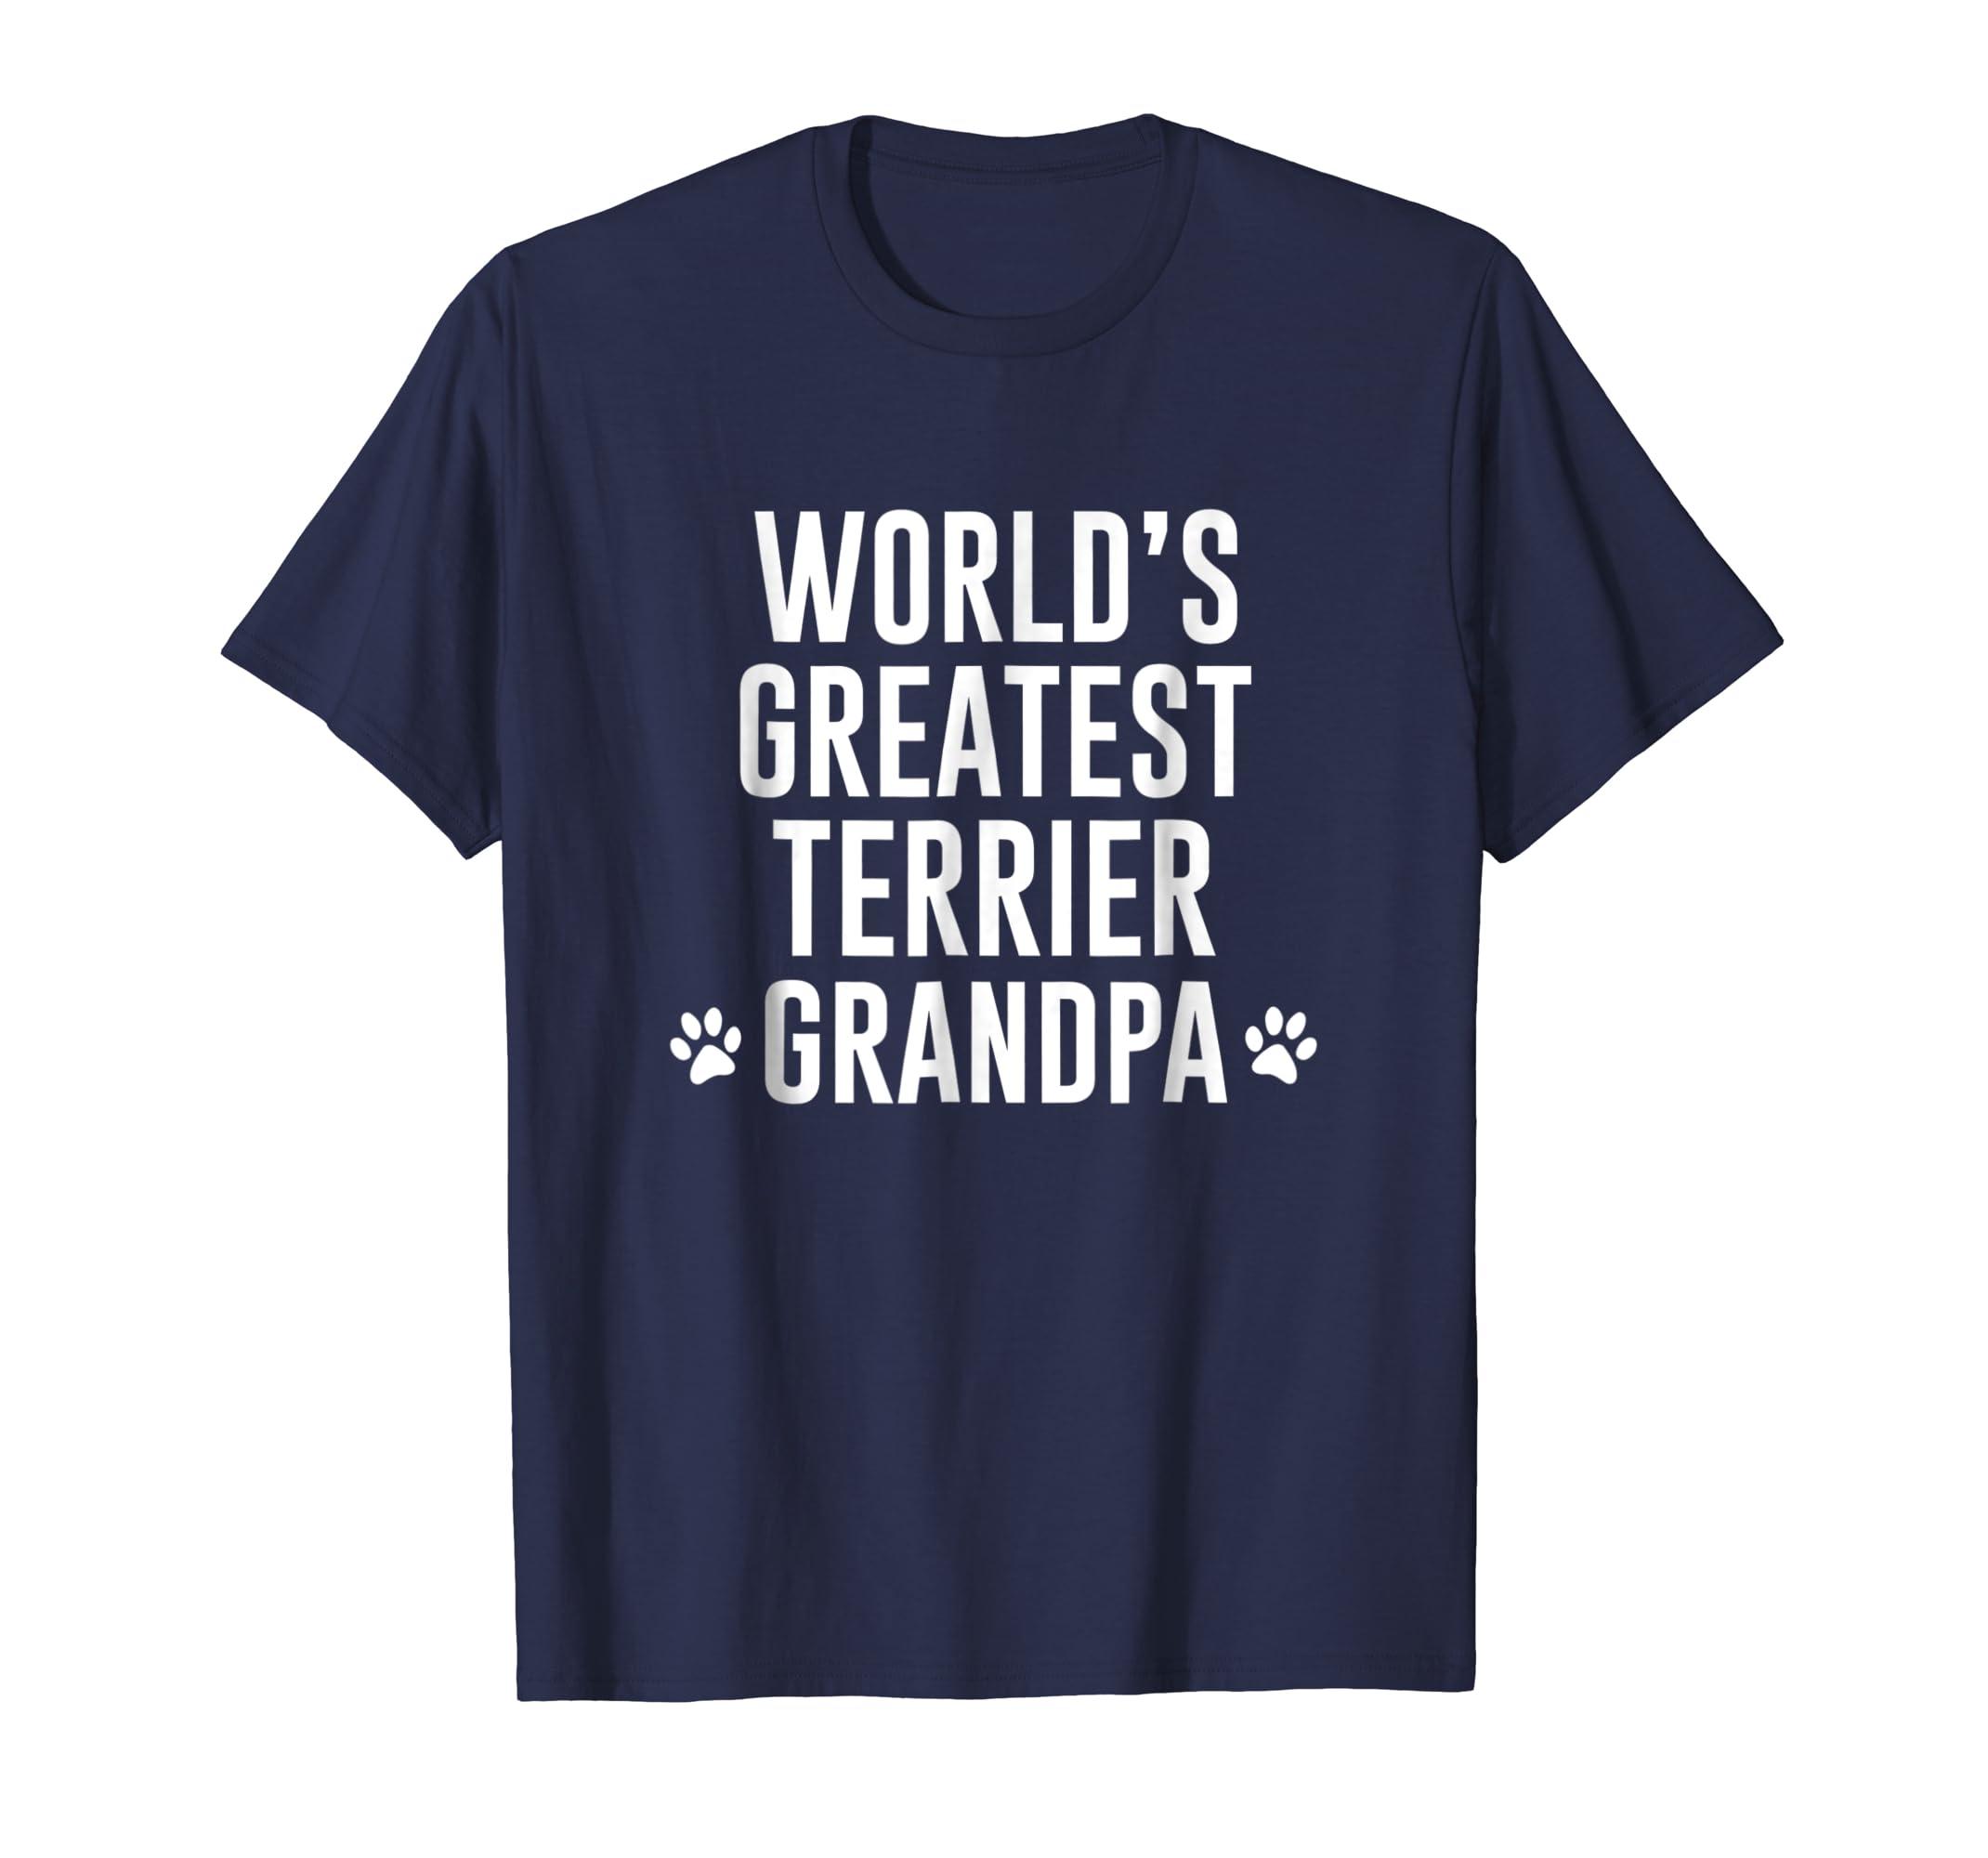 WORLDS GREATEST TERRIER GRANDPA TSHIRT-SFL